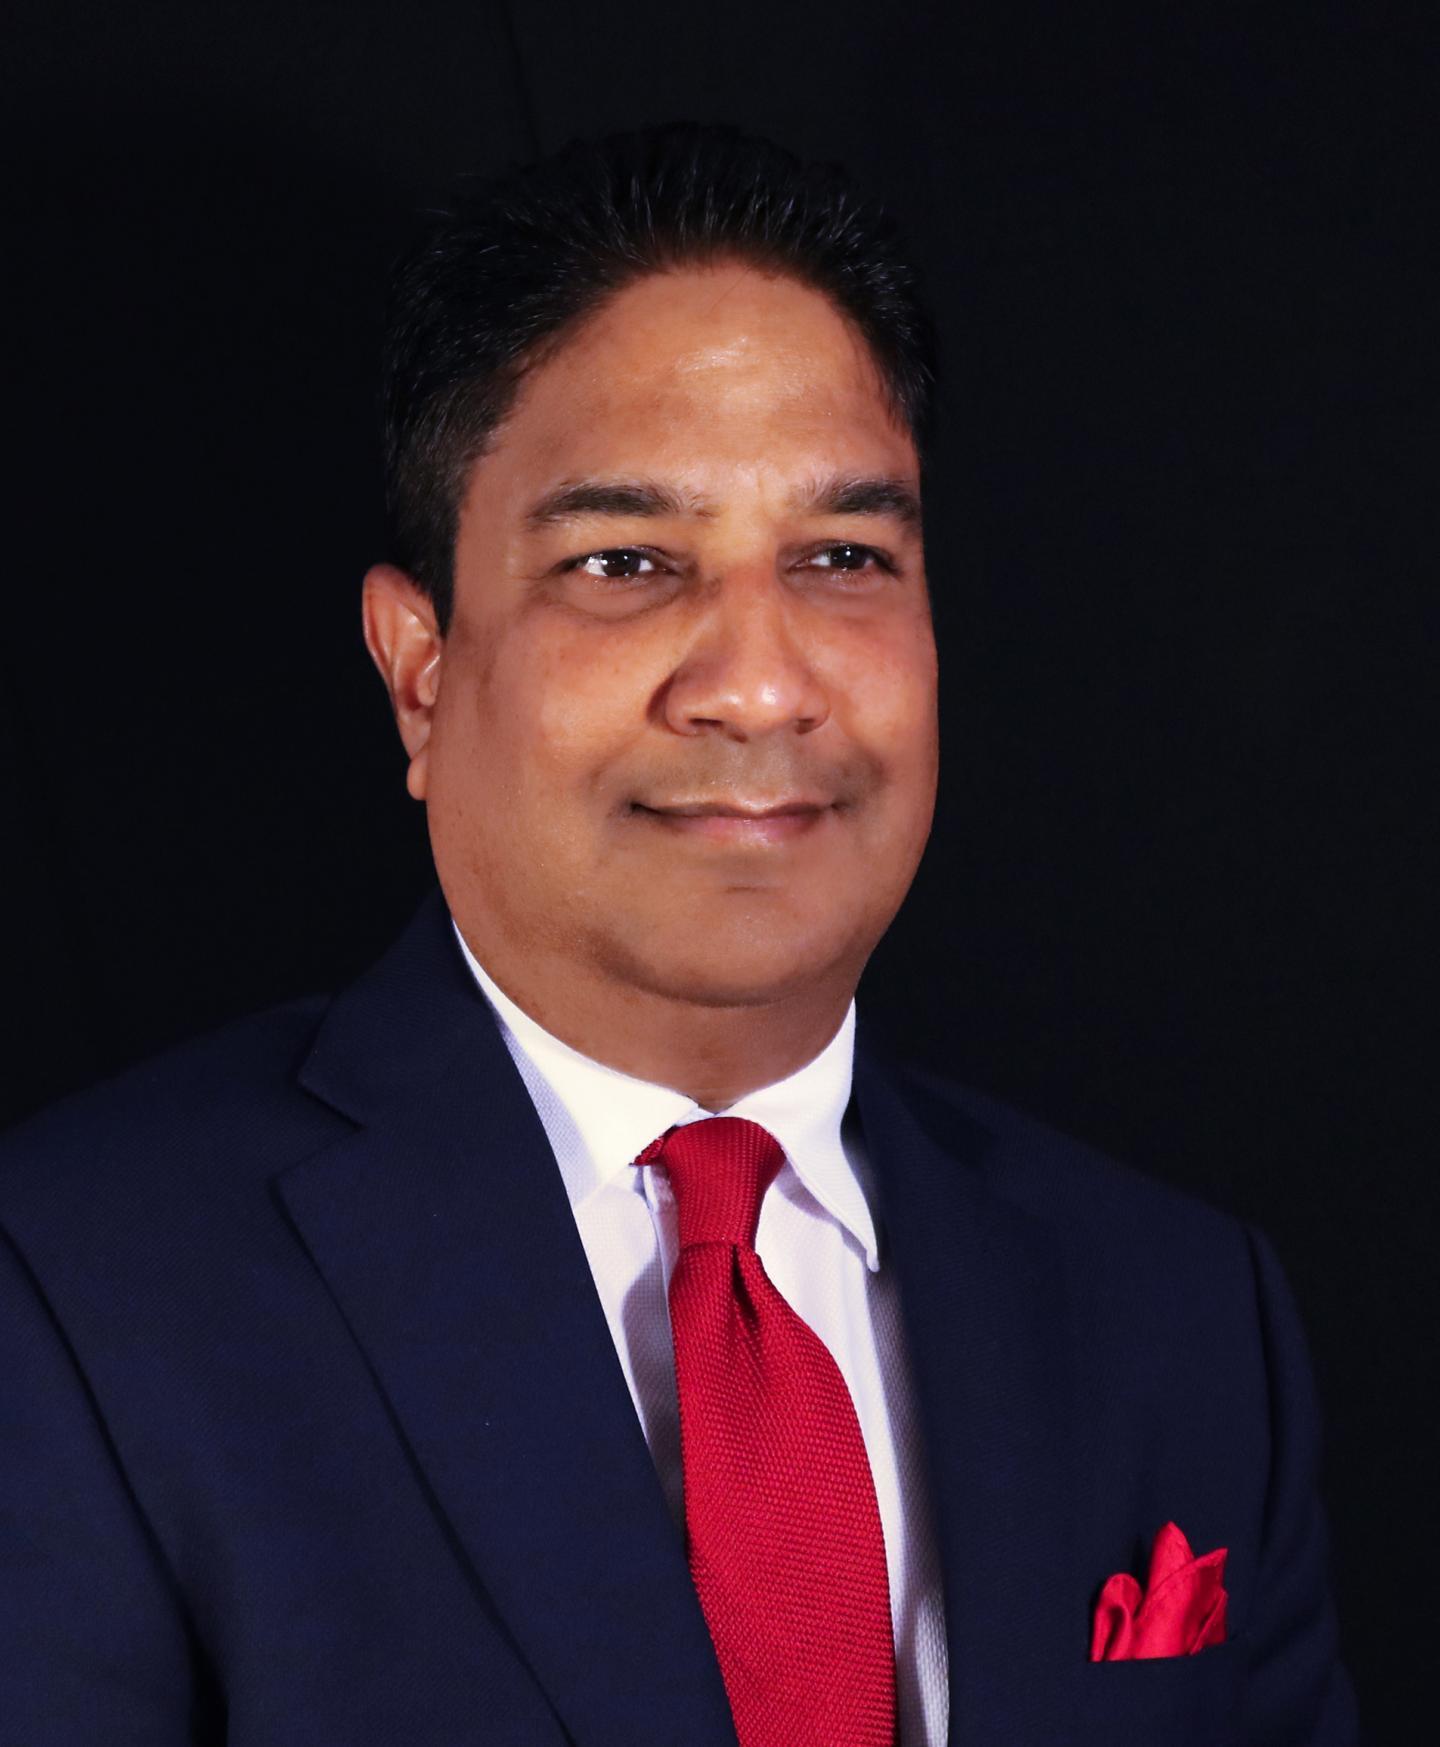 PD Dr. phil. Amit V. Pandey, University of Bern